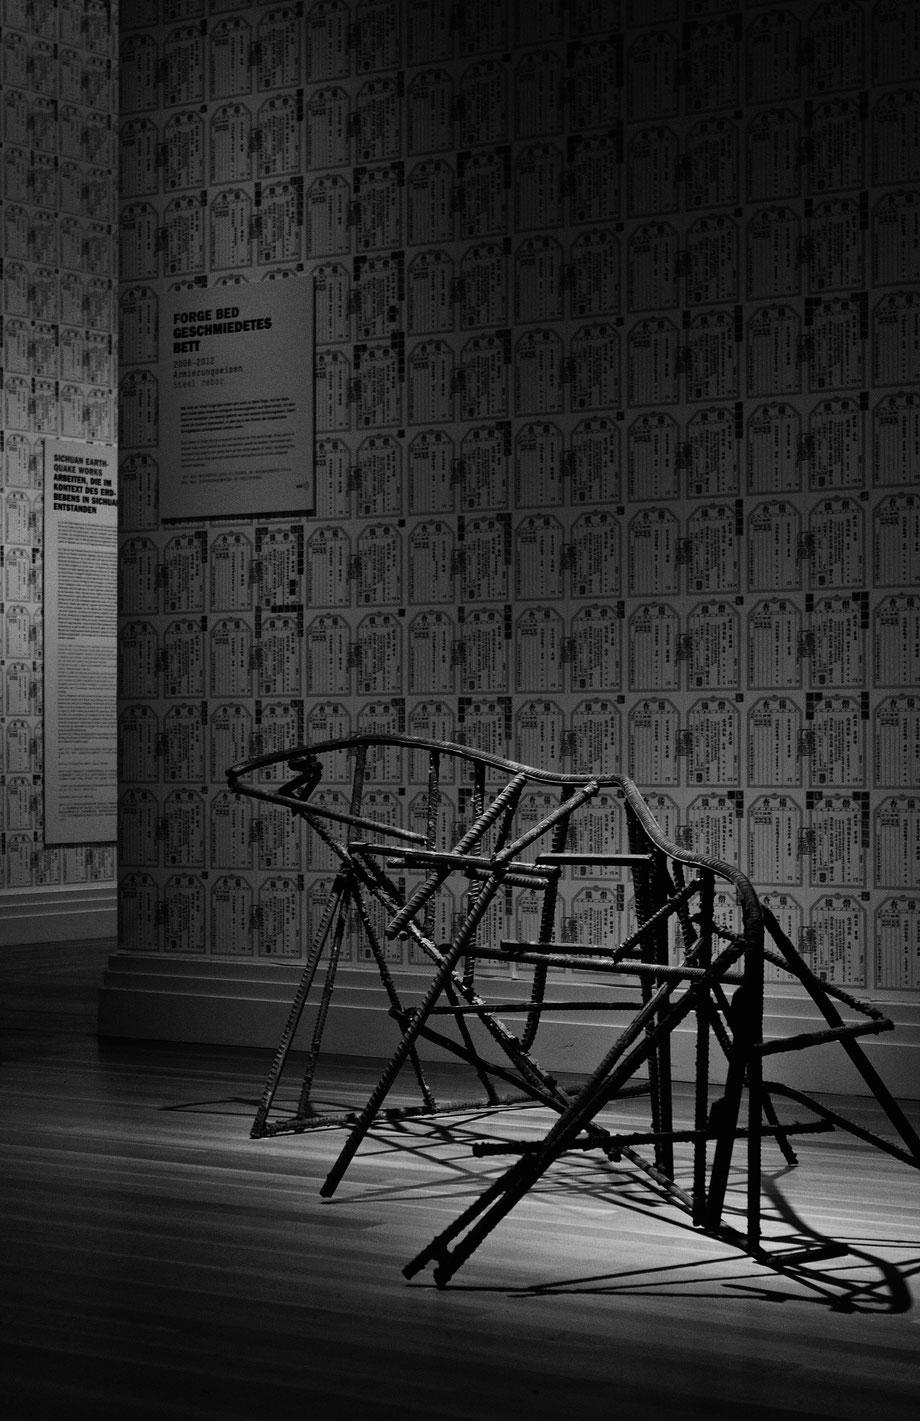 Ai Wei Wei Forge Bed Geschmiedetes Bett Exhibition Berlin Martin Gropius Evidence Laura Deberle Fotografie Documentation Photography